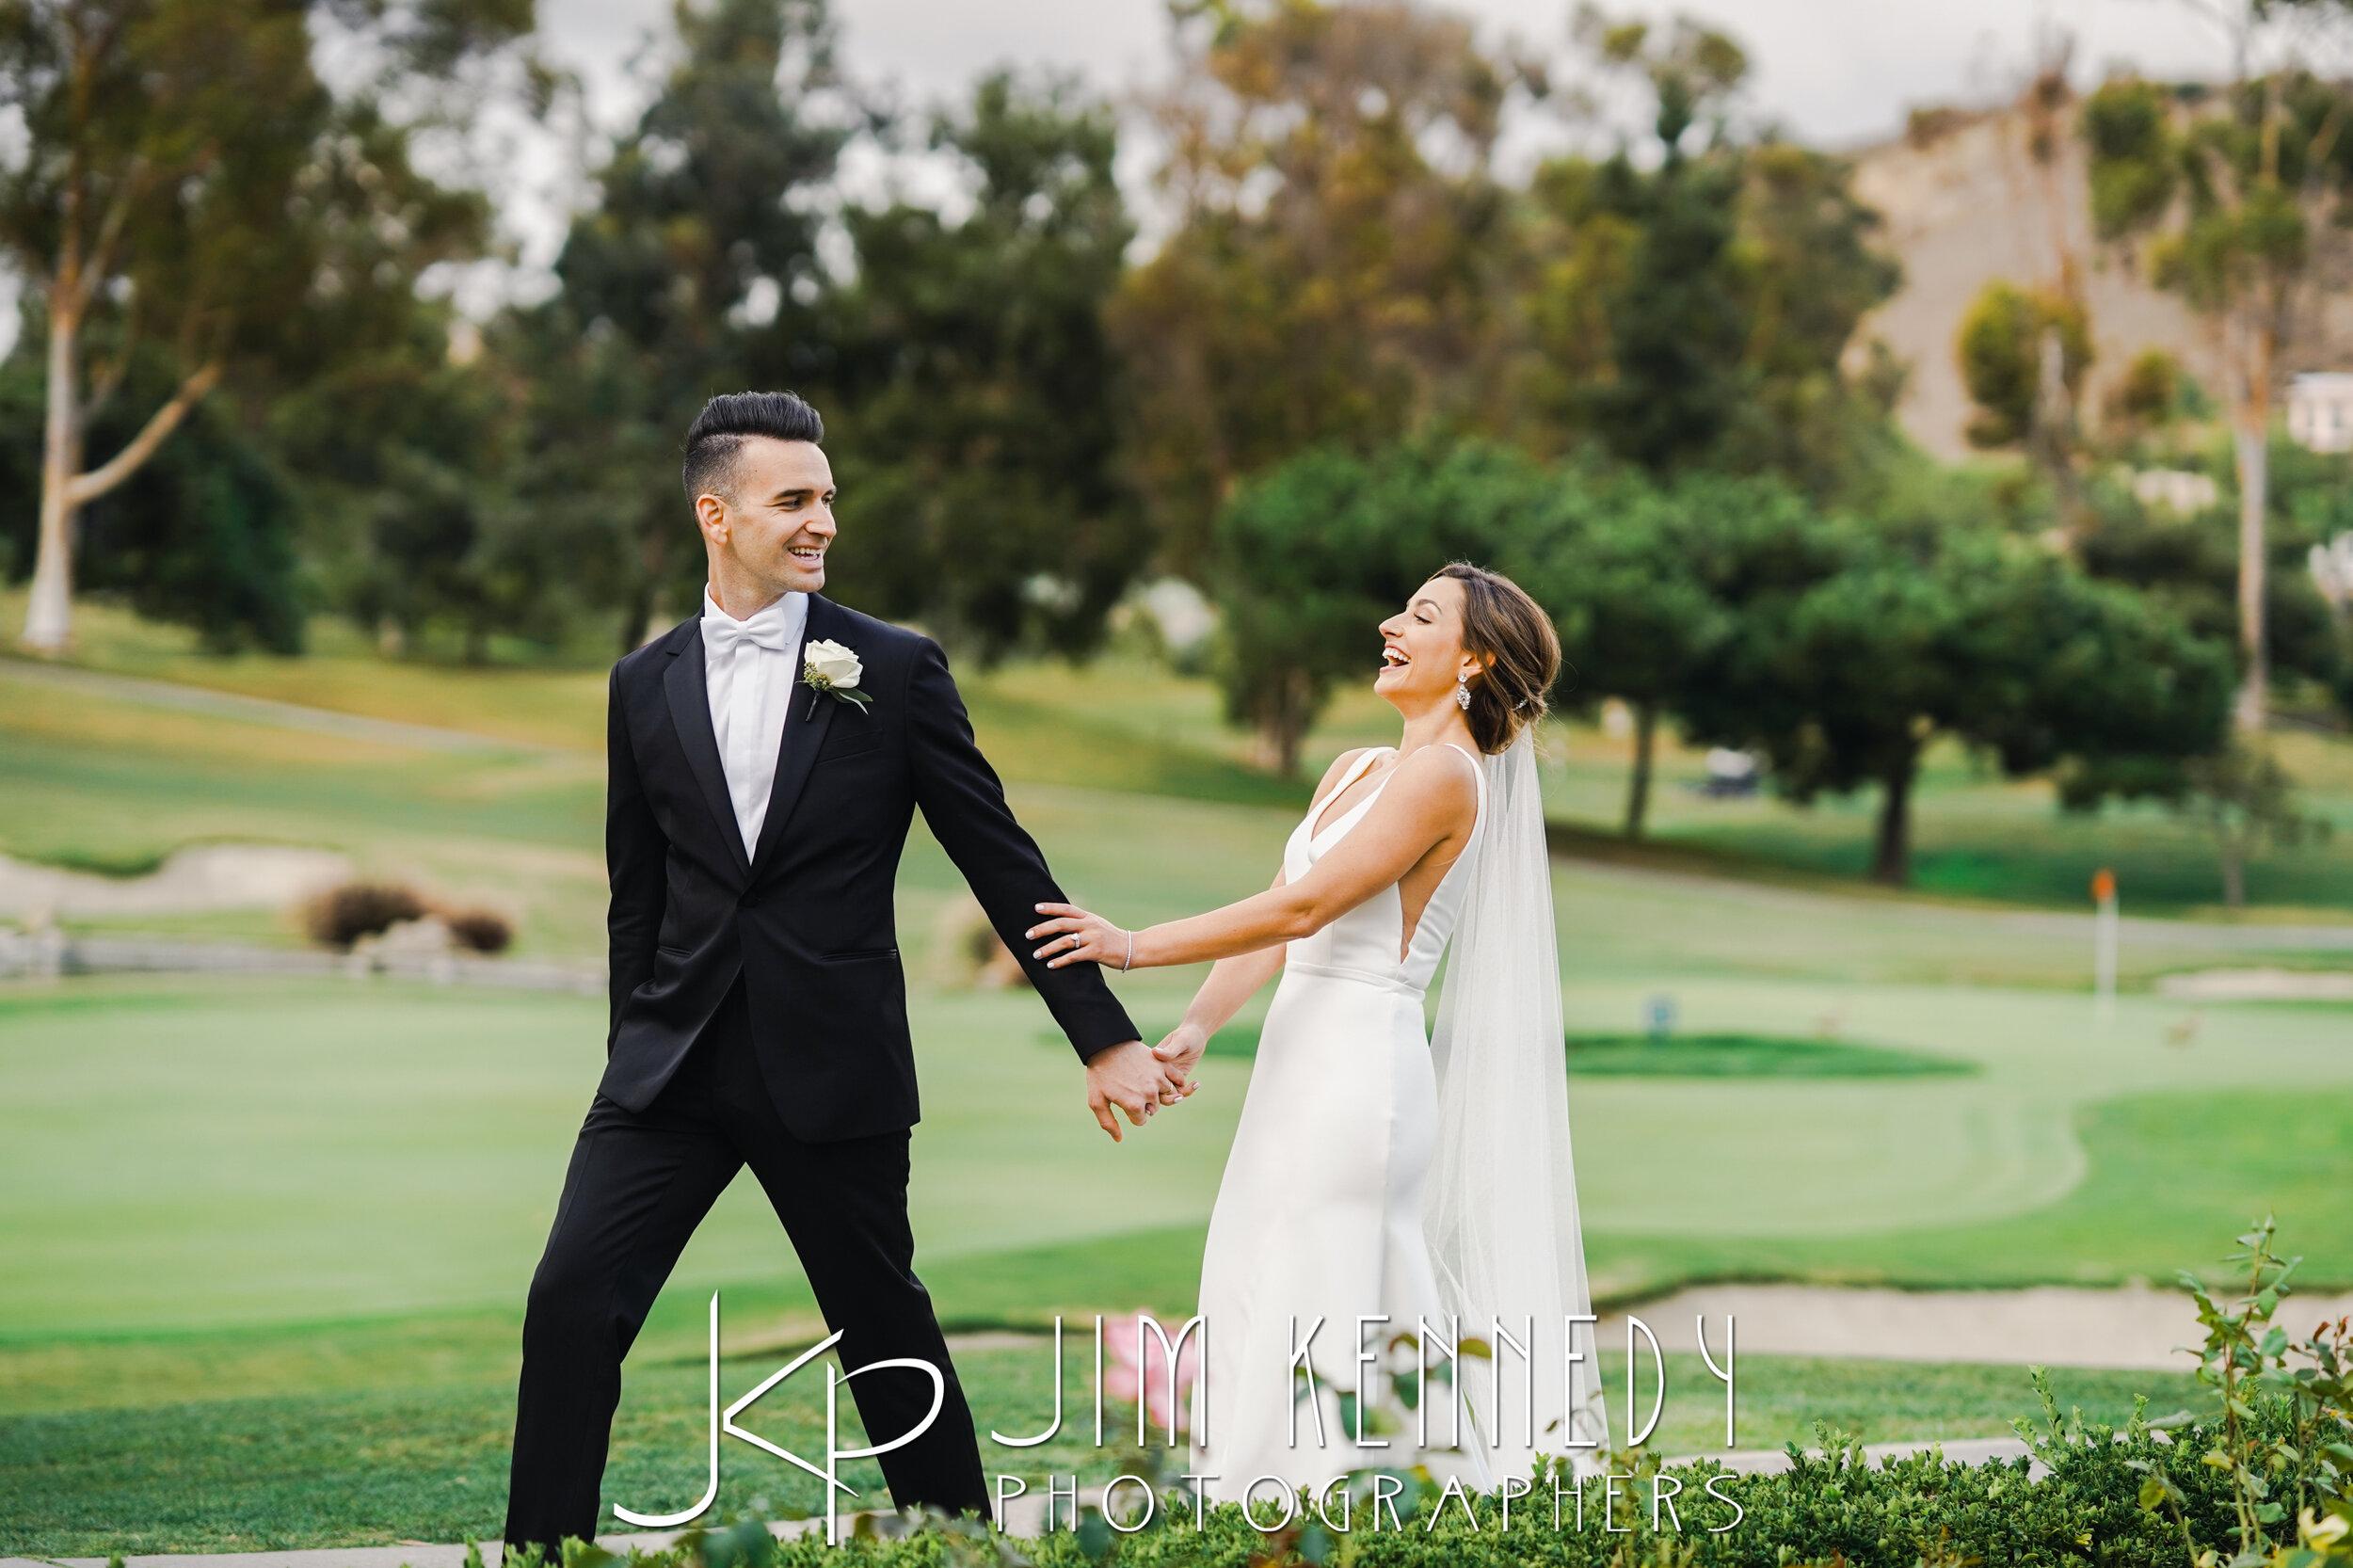 marbella-country-club-wedding-valerie-john_0171.JPG